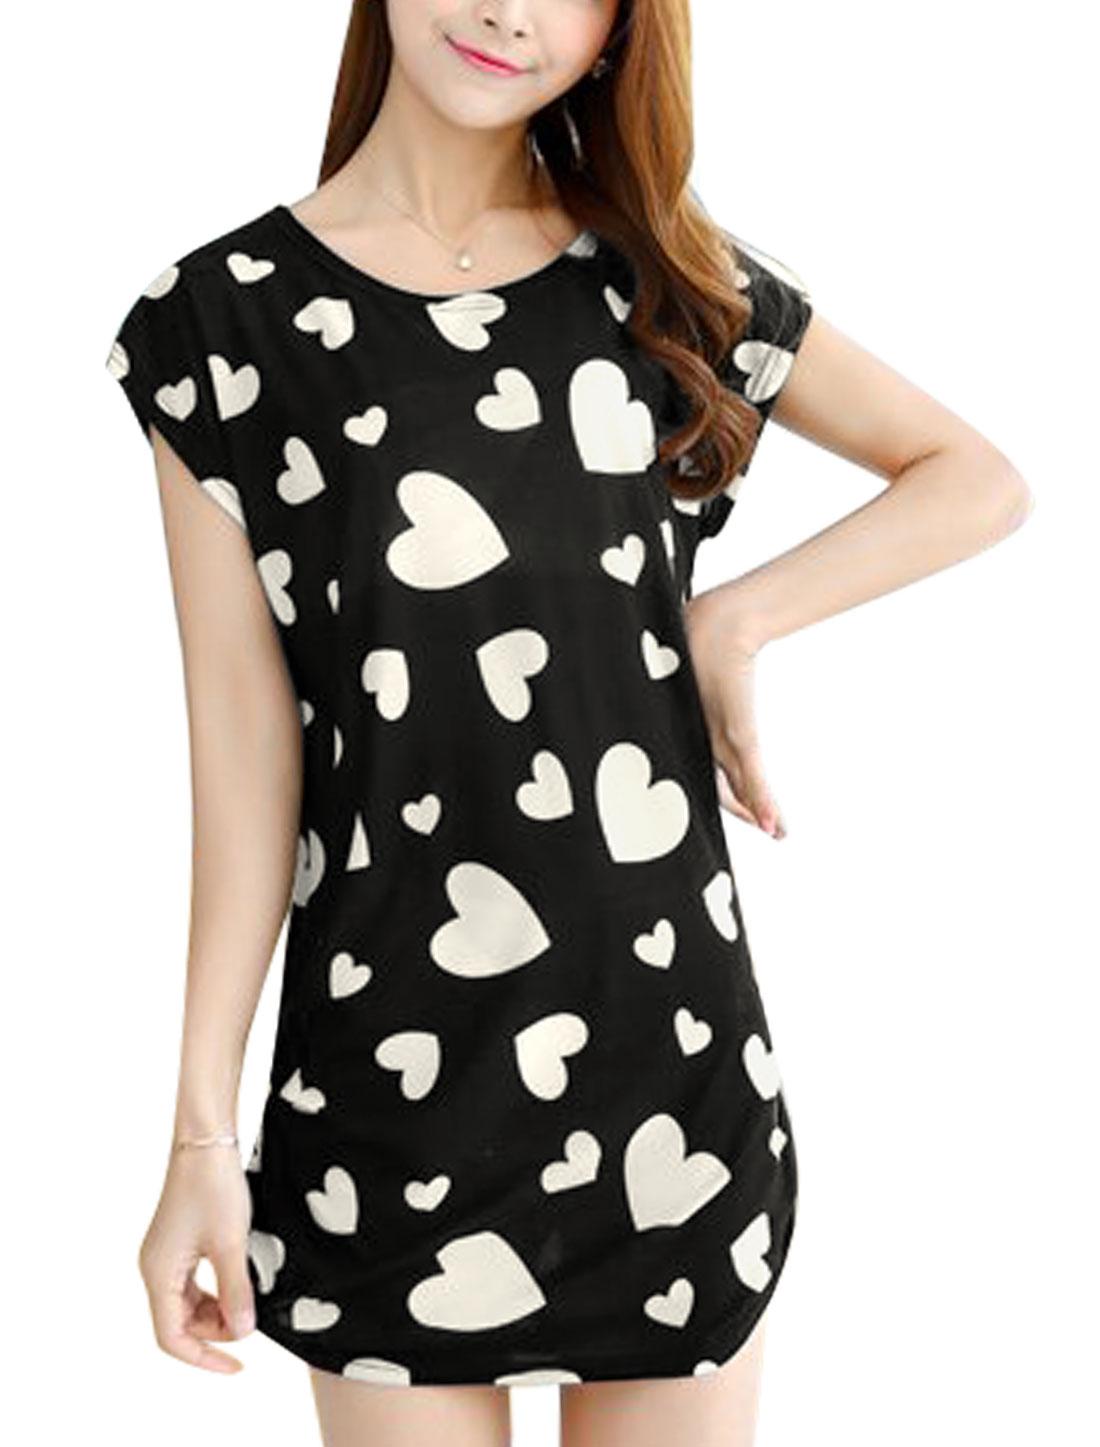 Women Short Dolman Sleeves Hearts Prints Shirred Sides Tunic Dress Black S